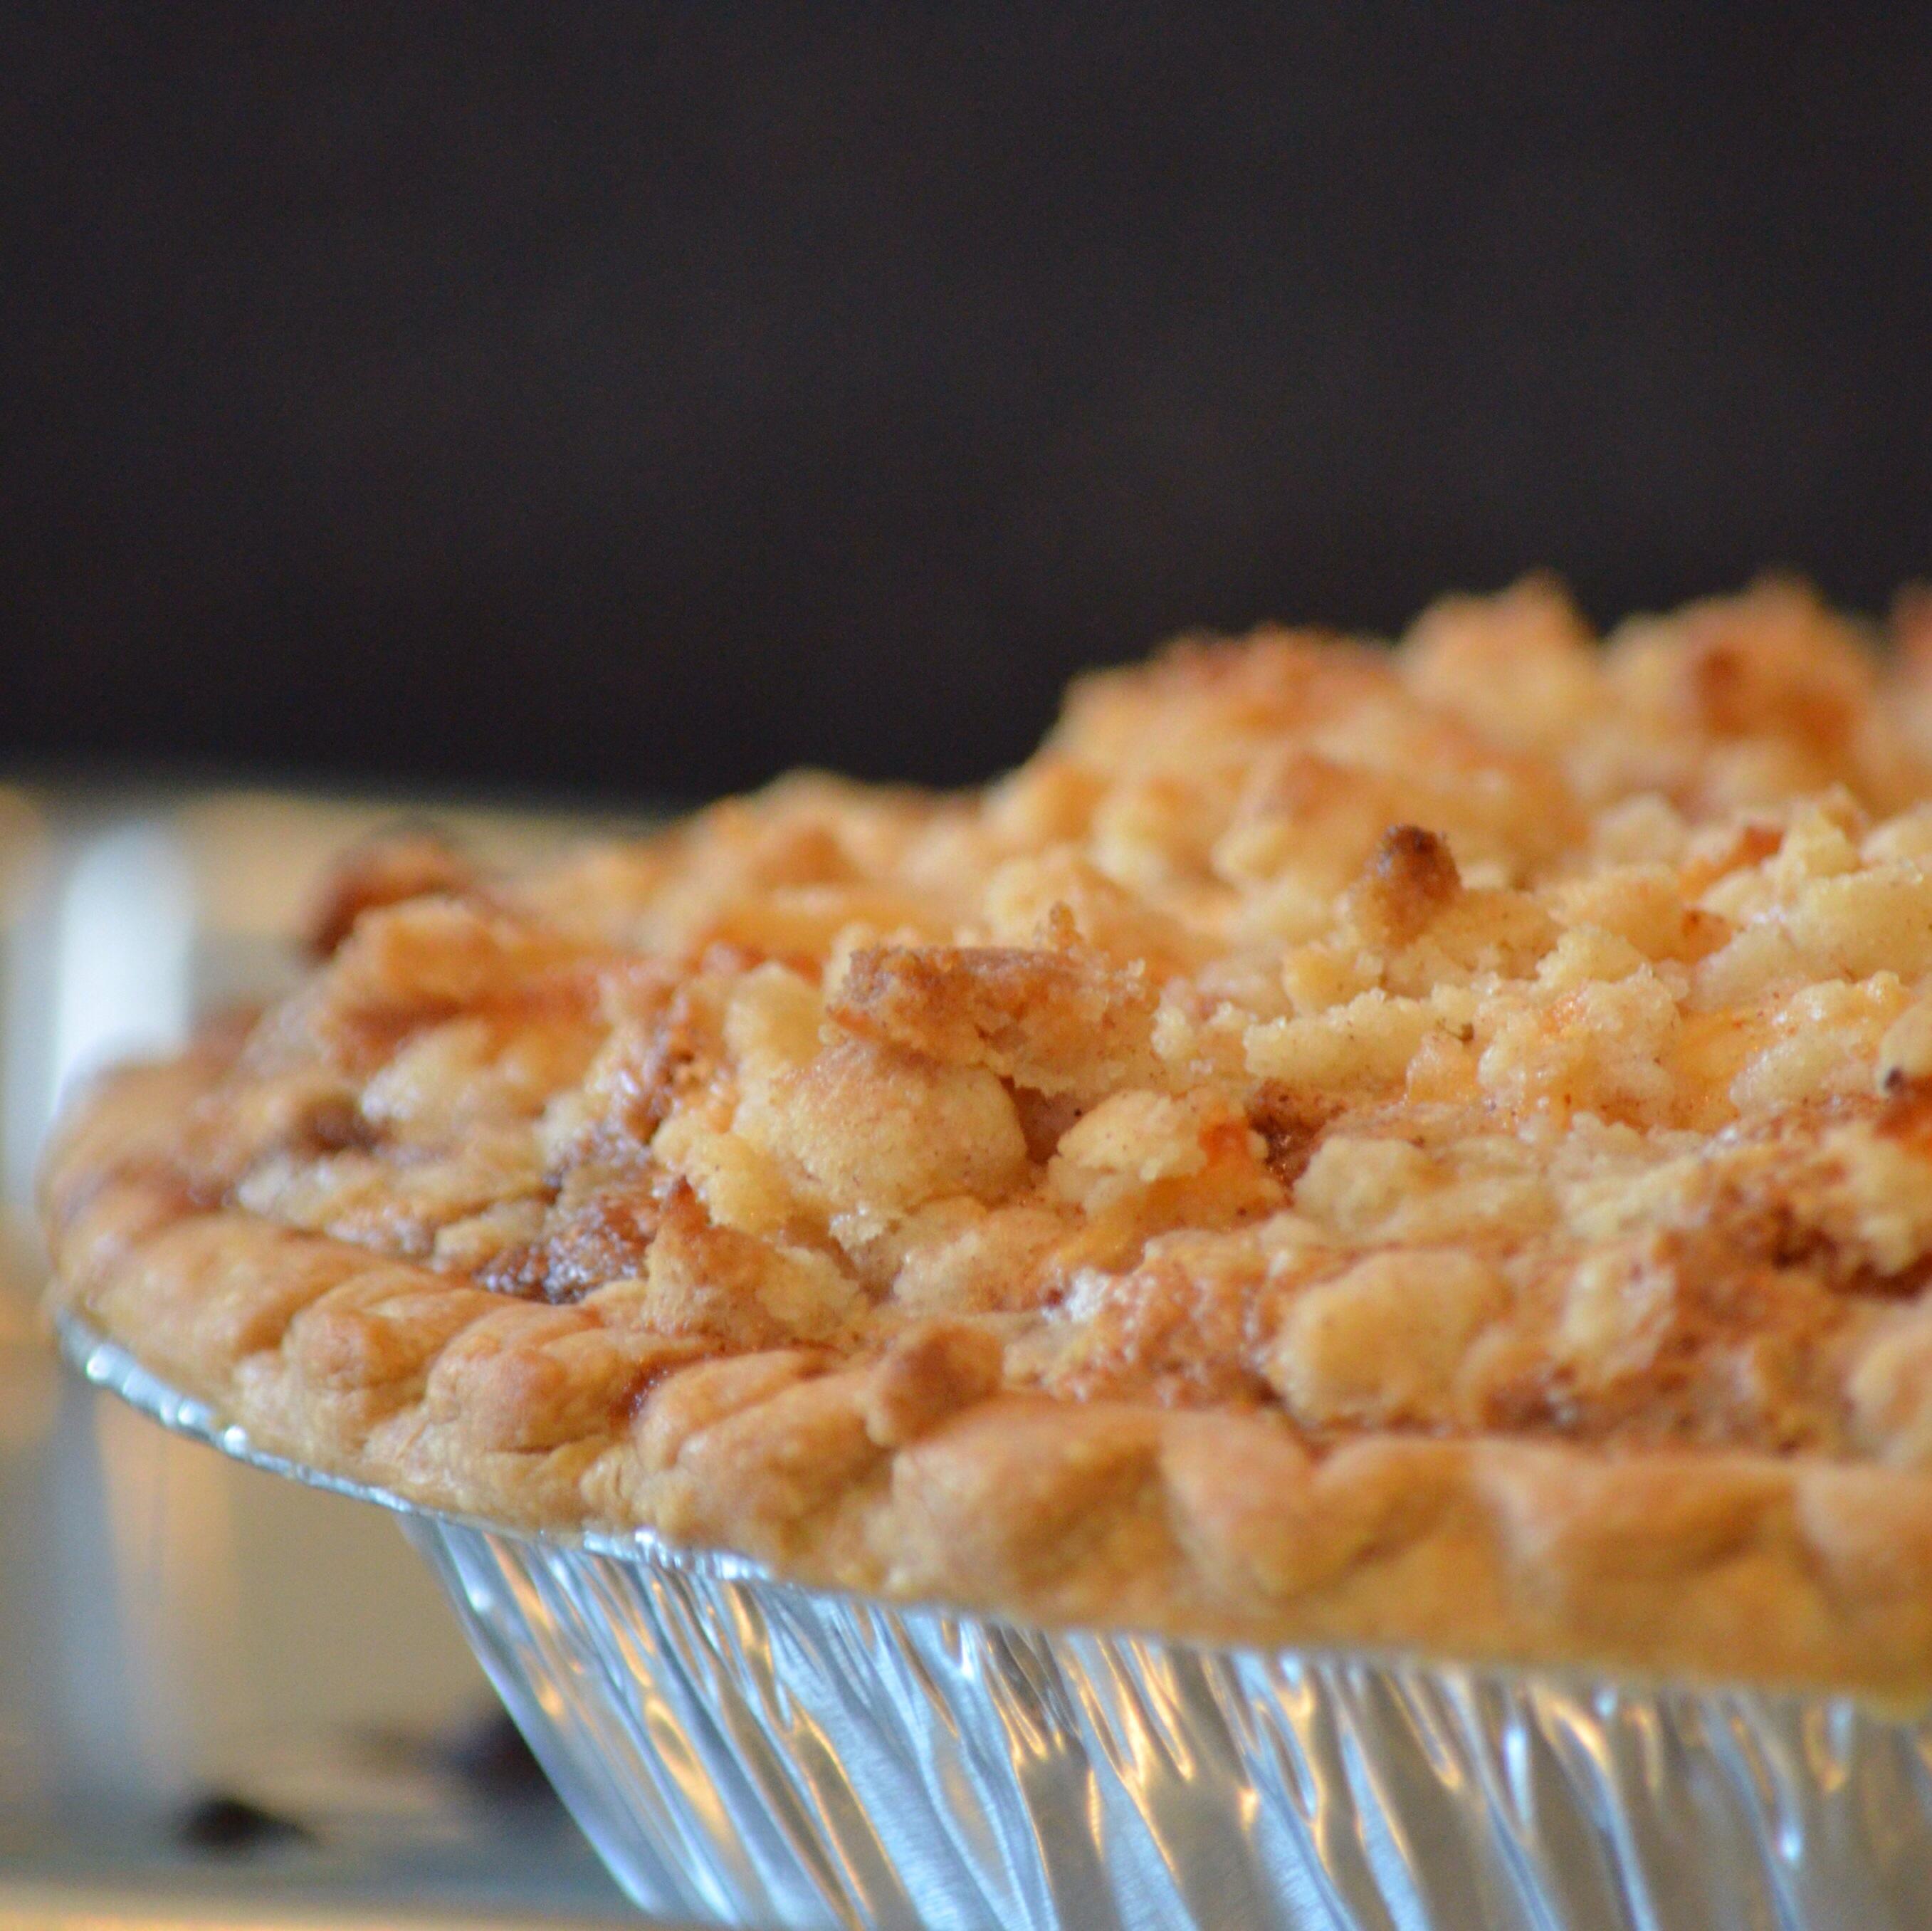 ... ://whitepicketmoments.wordpress.com/2013/10/19/apple-pie-for-dessert